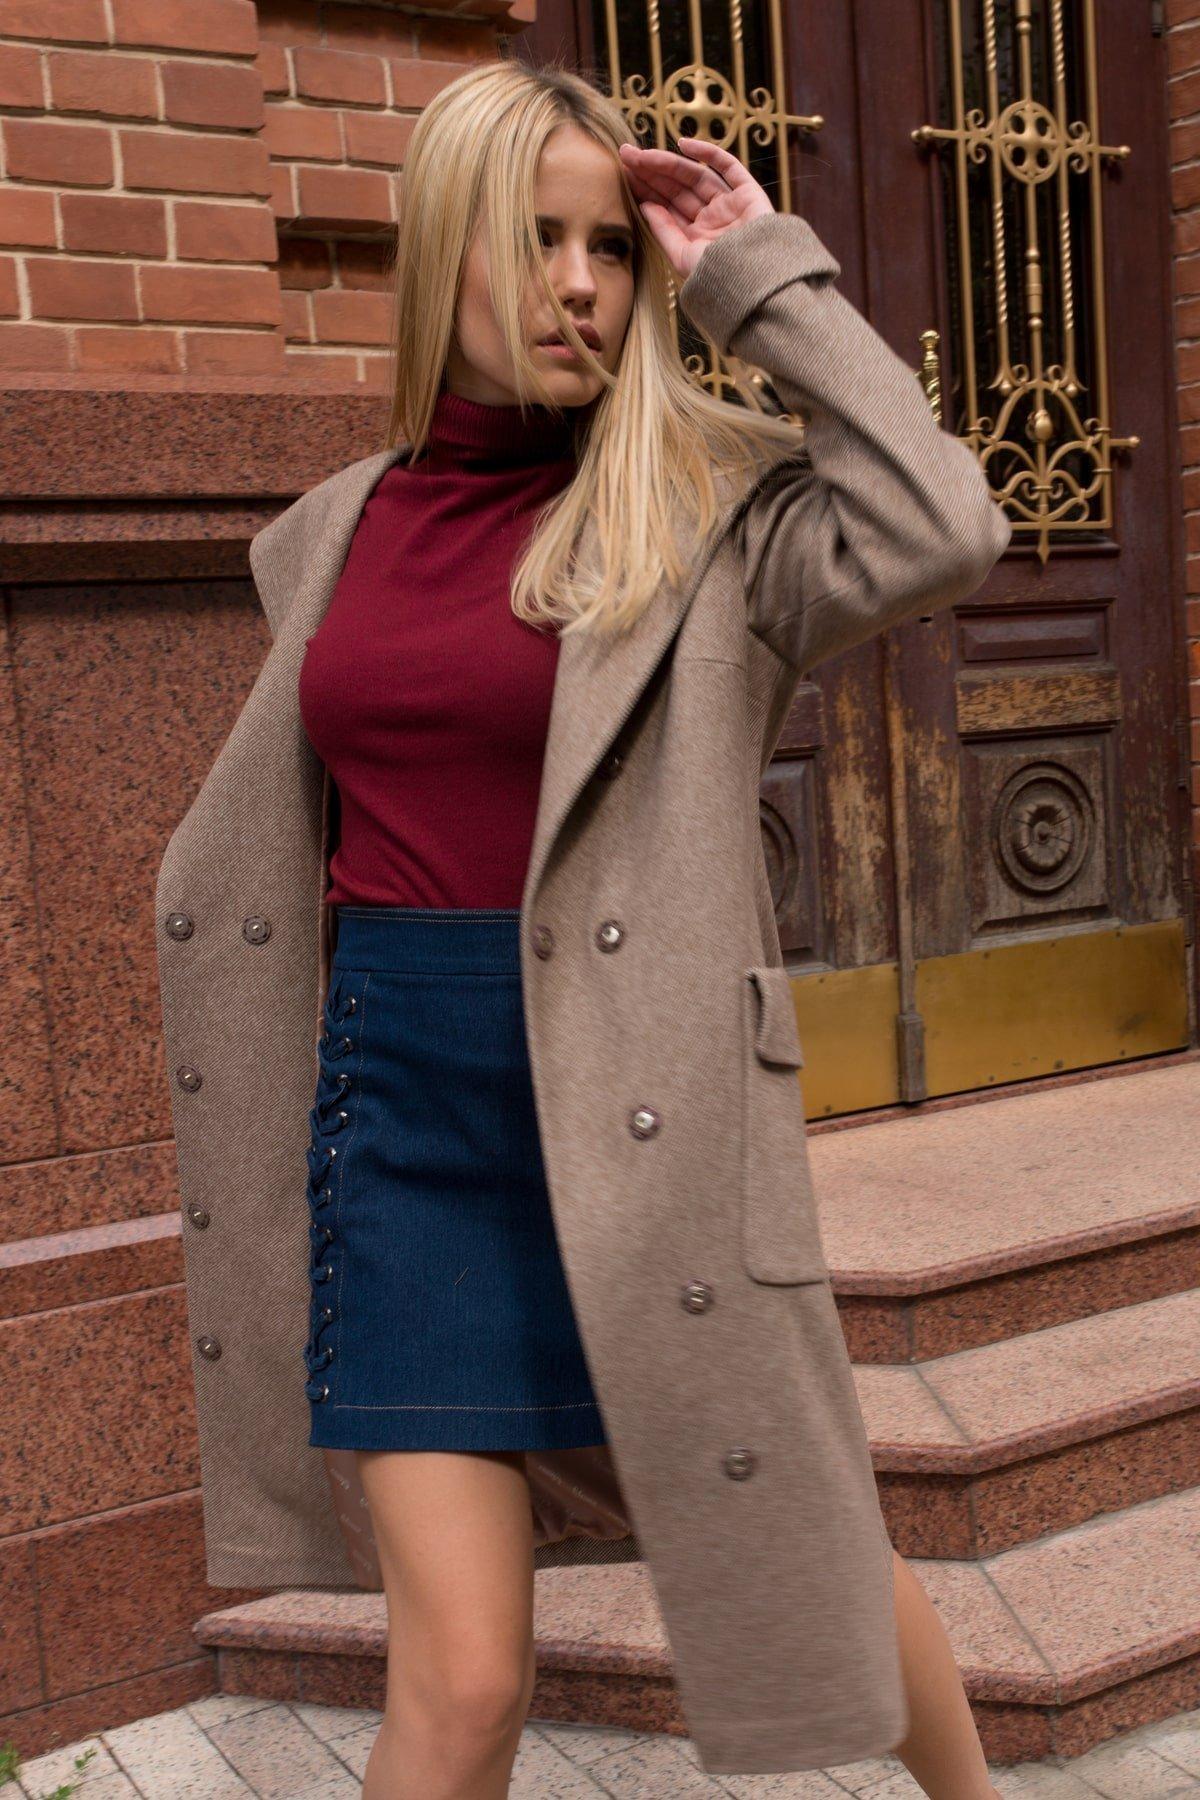 Пальто Анджи 7806 АРТ. 45168 Цвет: Капучино 31 - фото 4, интернет магазин tm-modus.ru